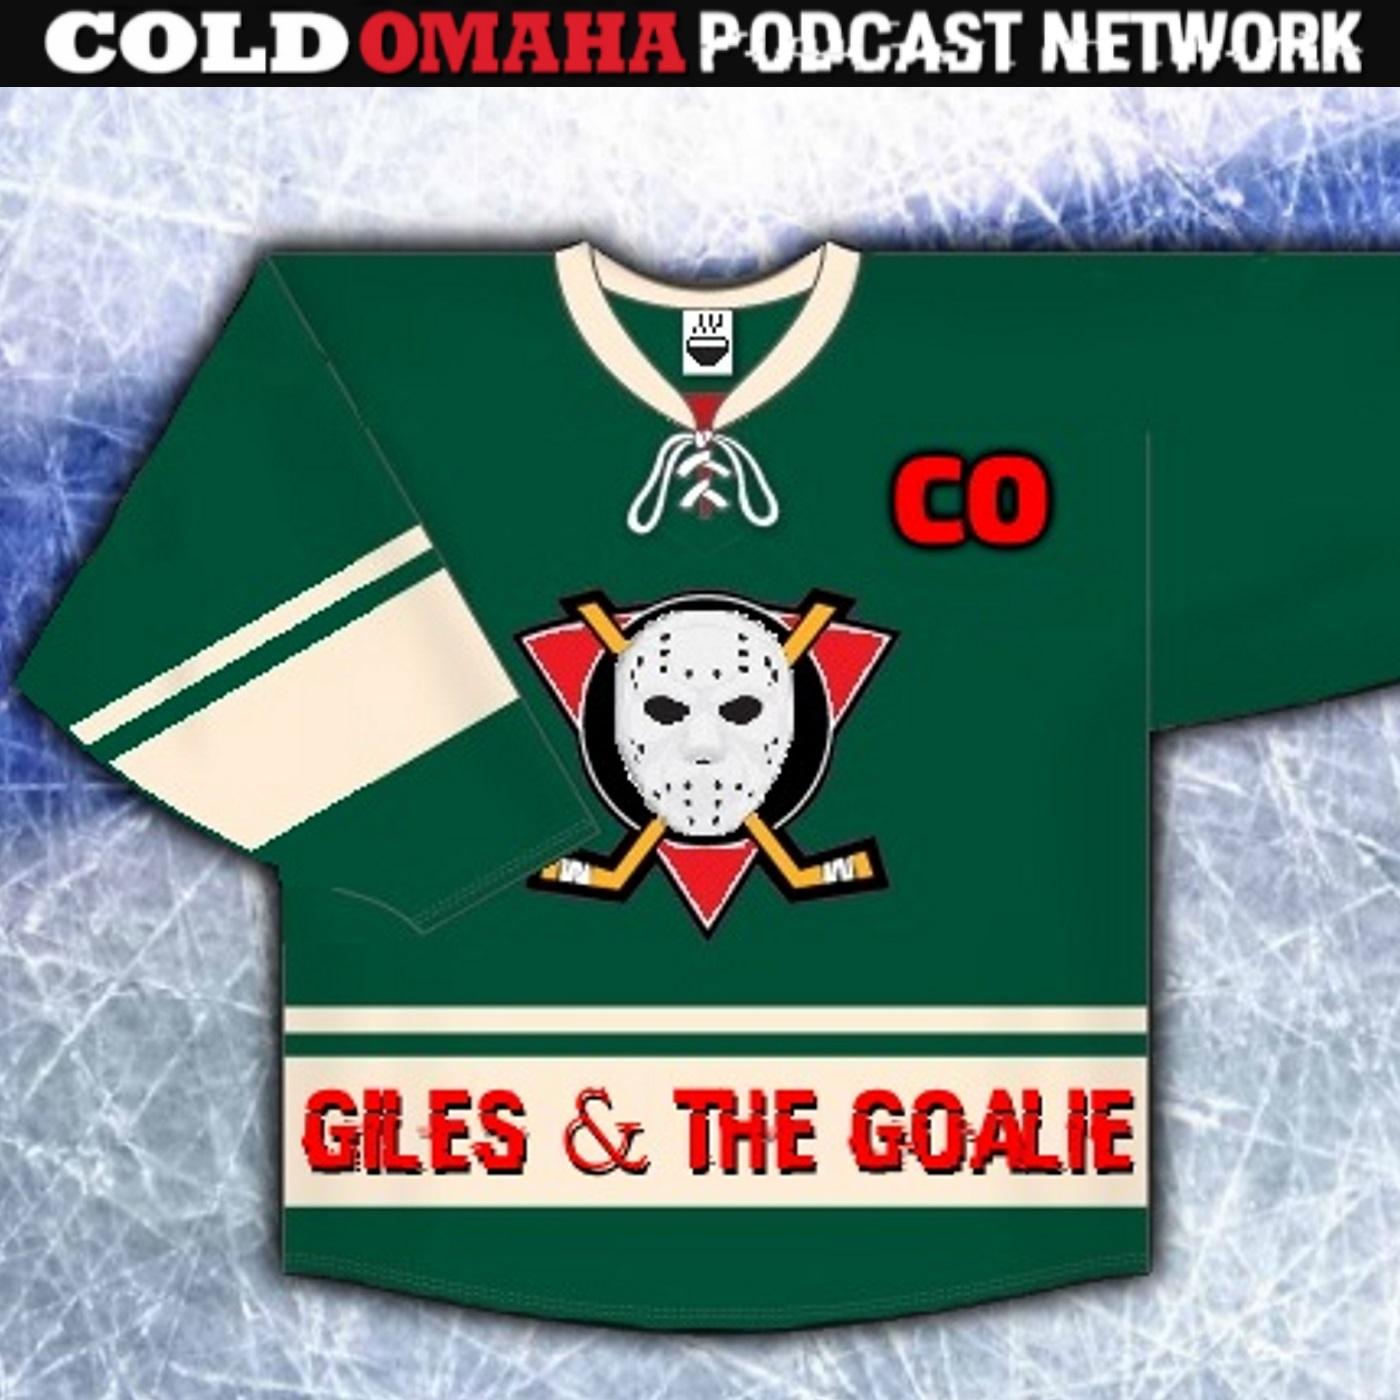 Giles and the Goalie - A Minnesota Wild Podcast logo